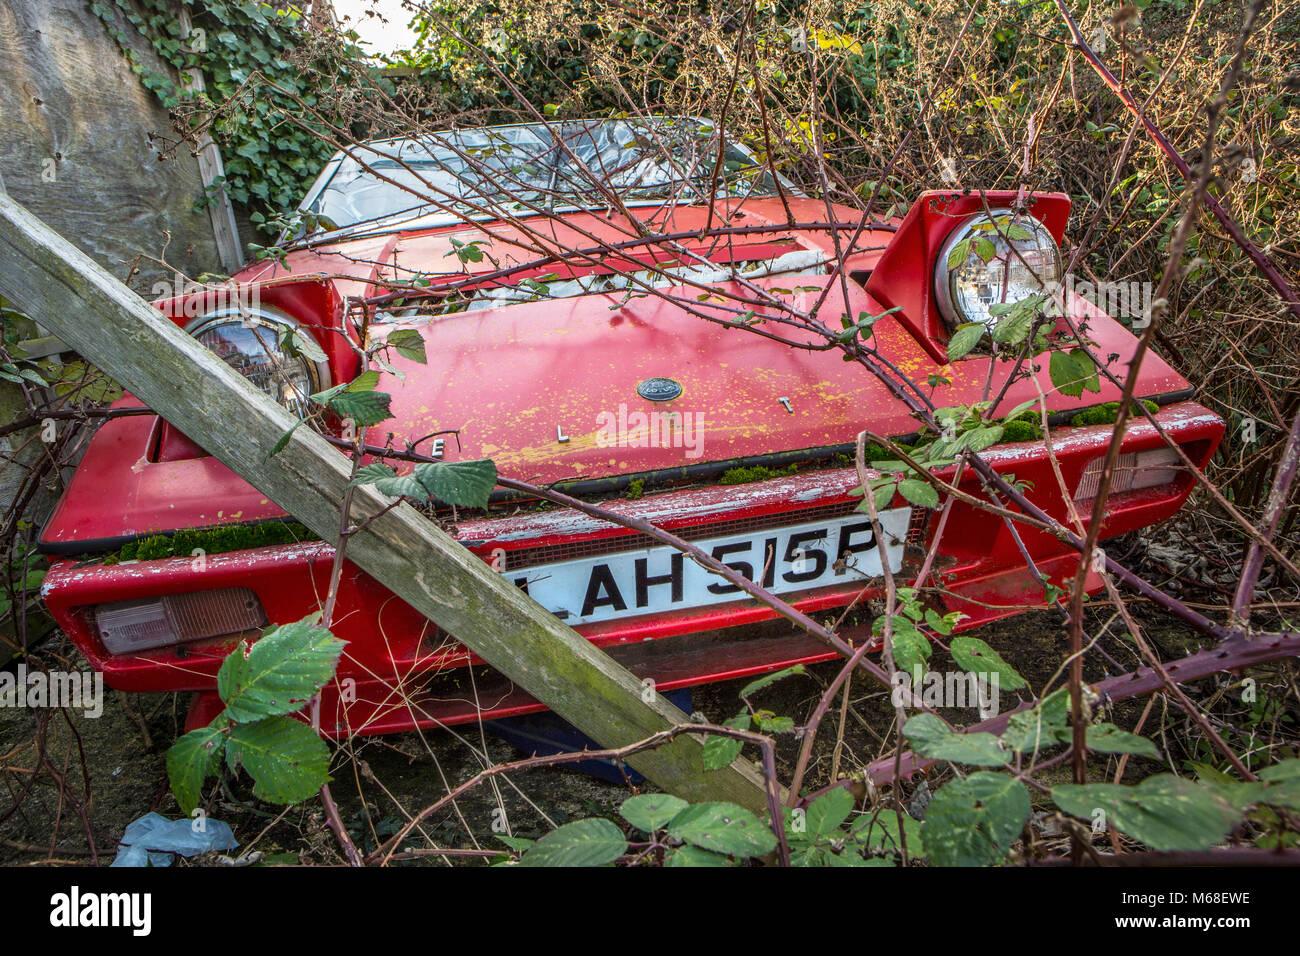 A derelict overgrown Lotus Elite - Stock Image